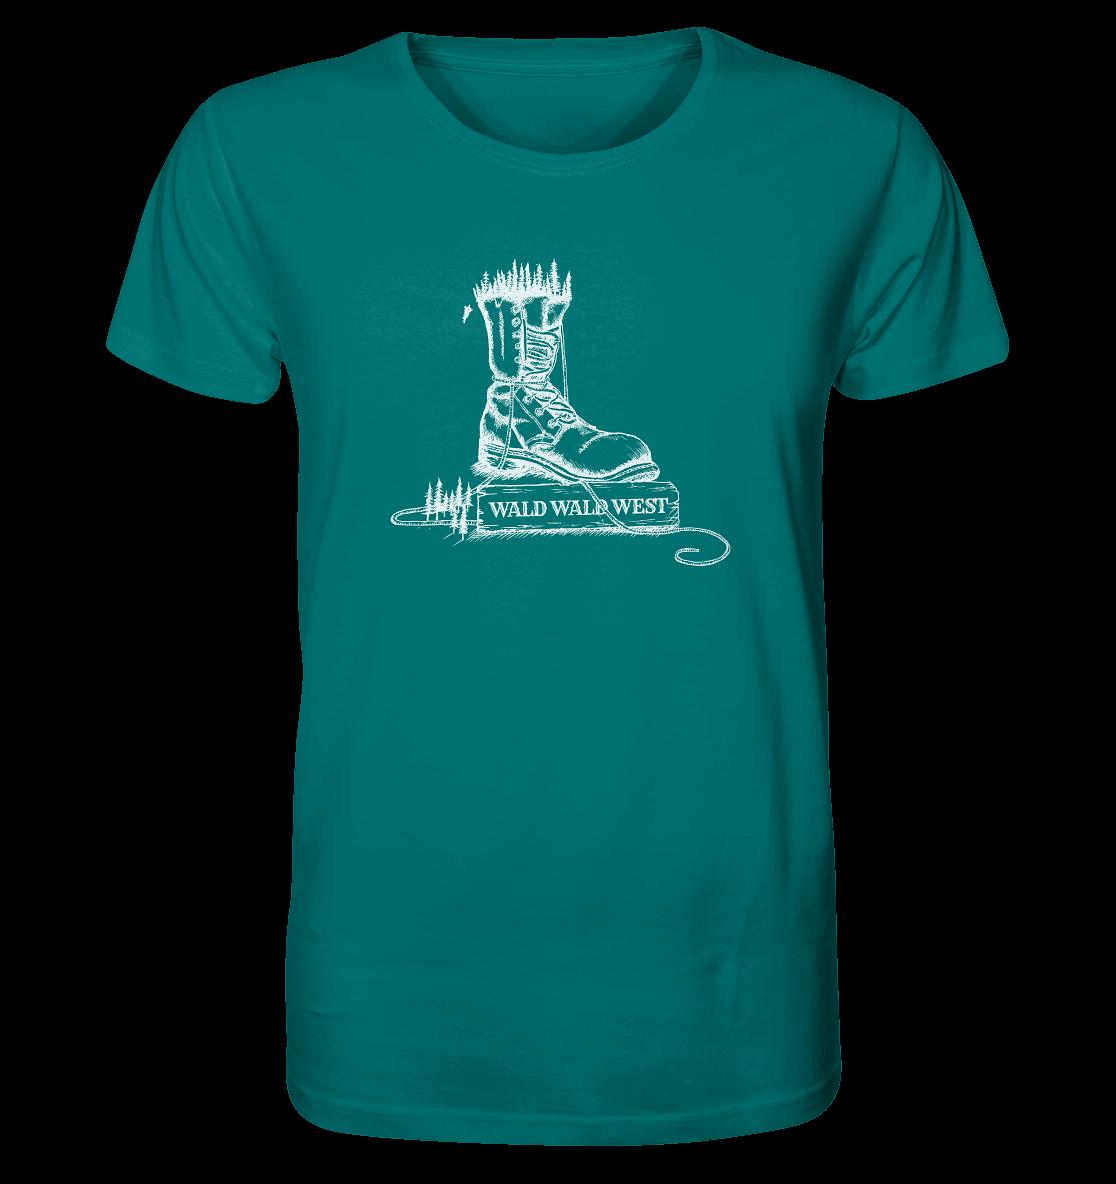 front-organic-shirt-007373-1116x.png